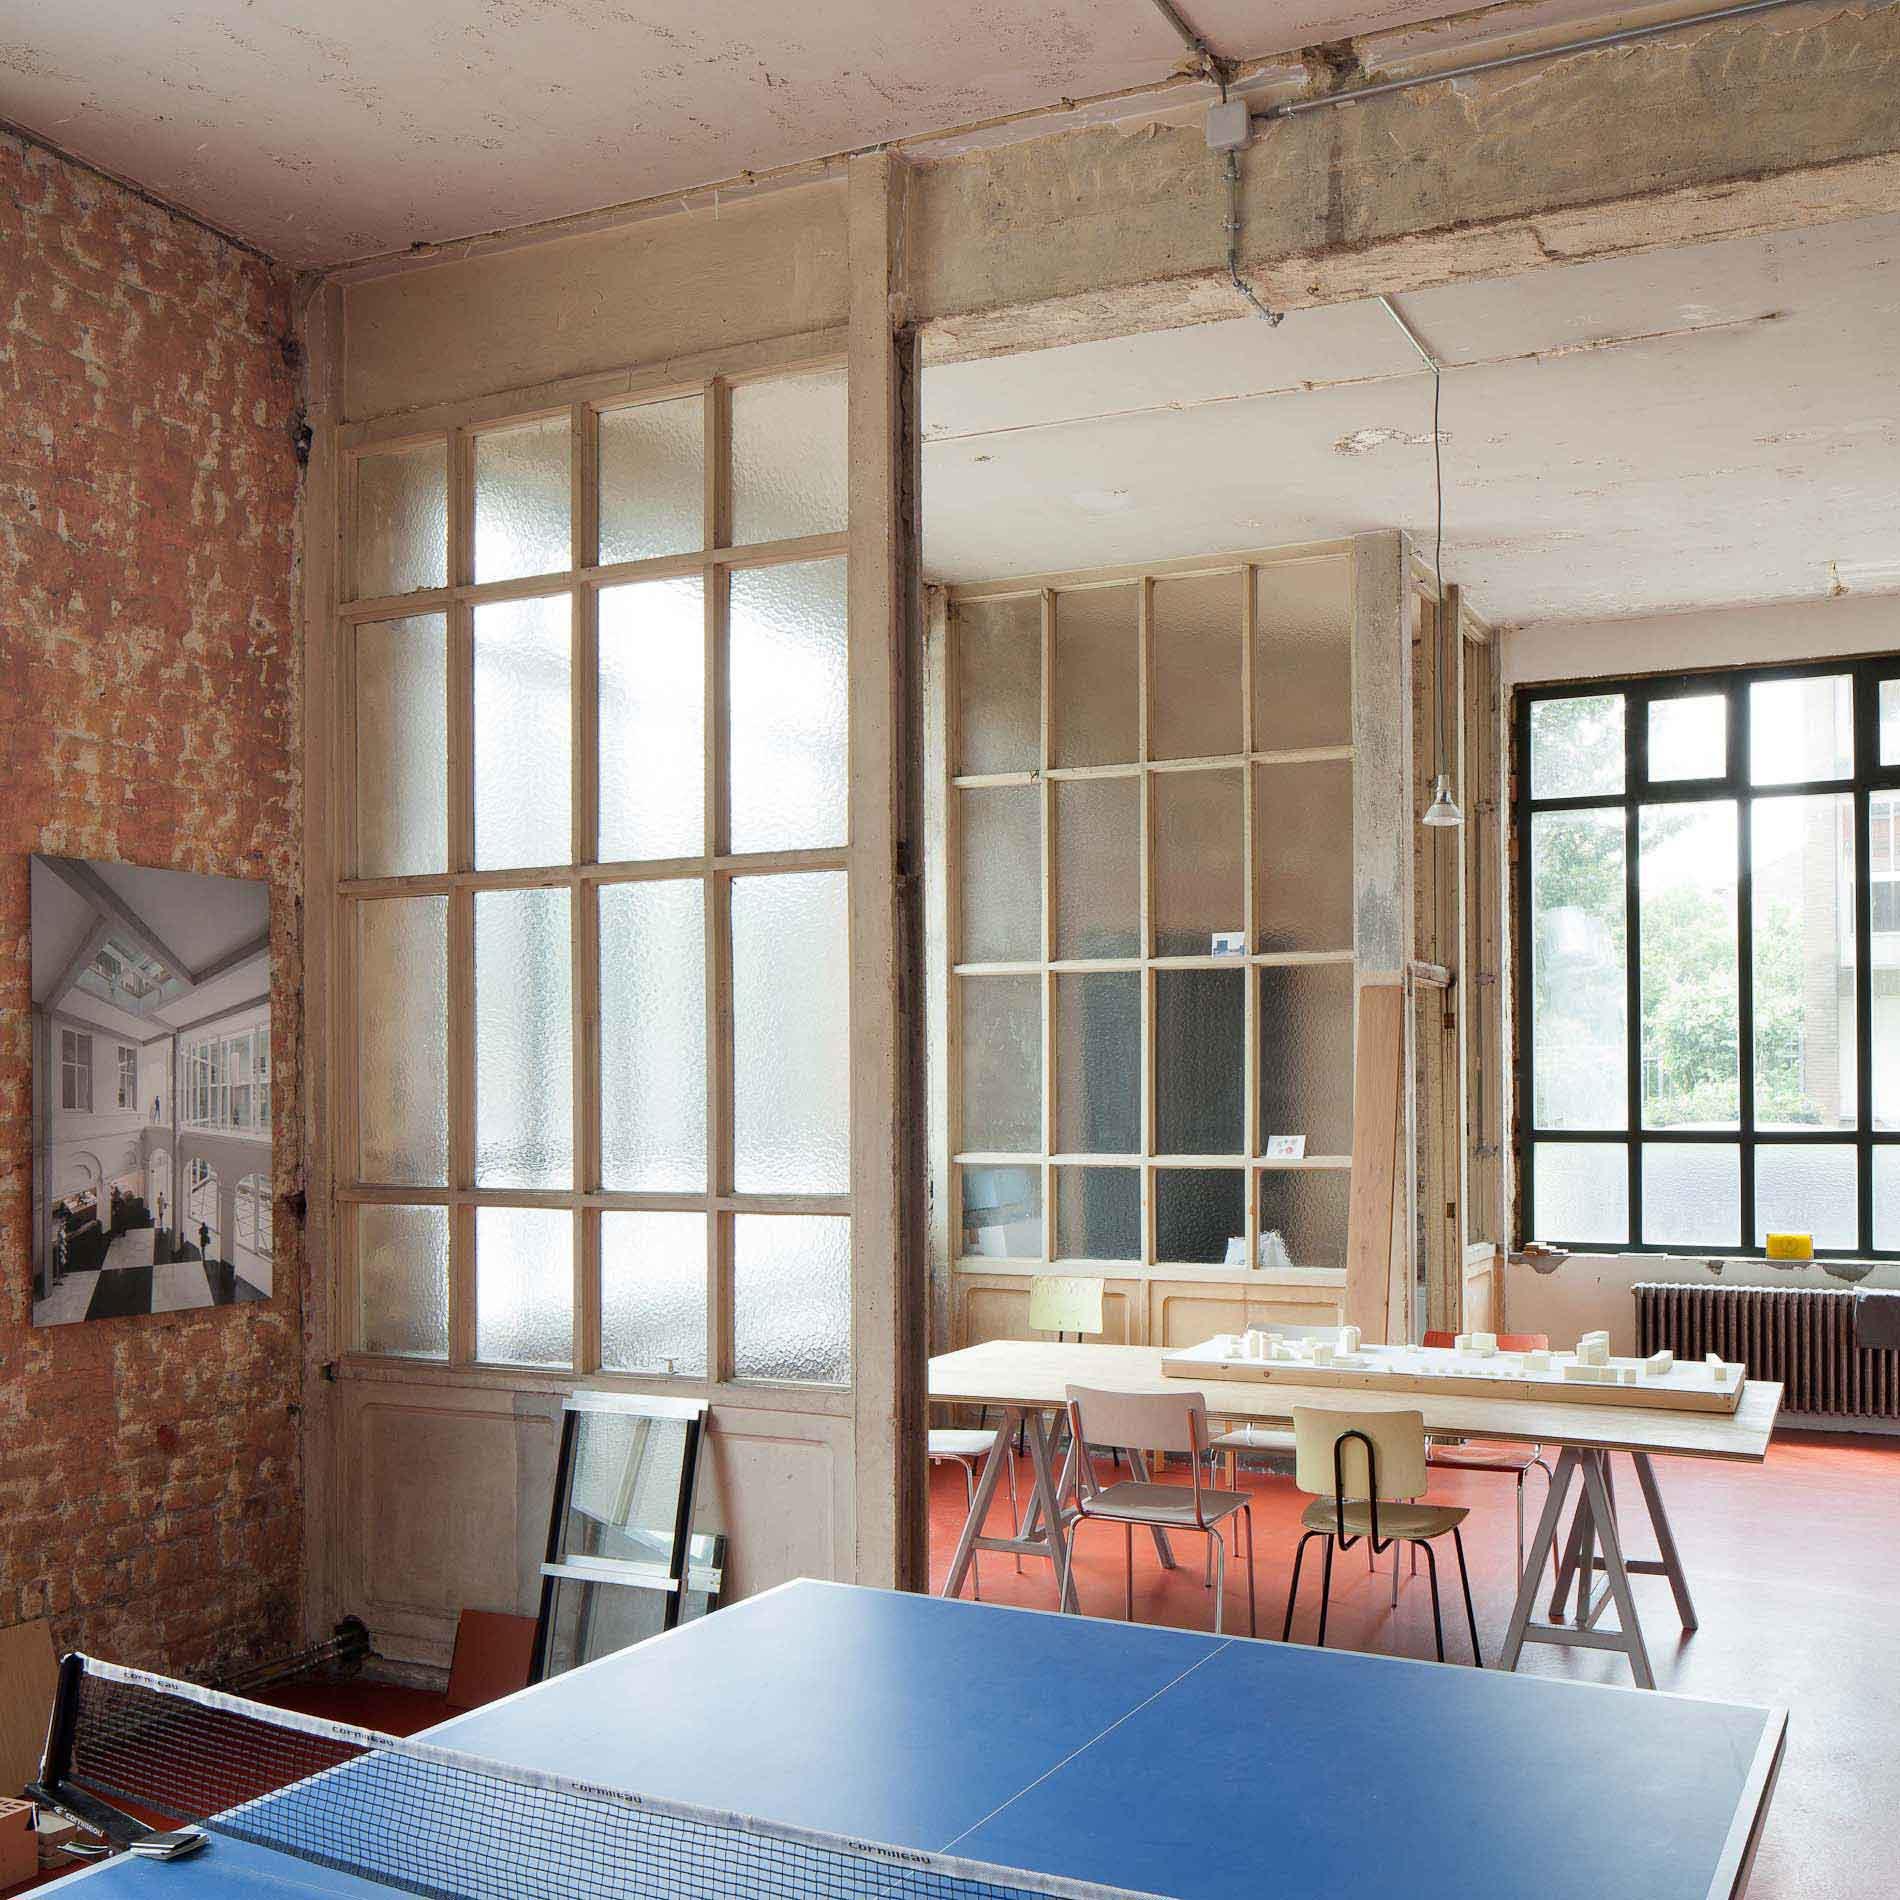 NOA Architect's Office & Garden Frederik Vercruysse | Yellowtrace